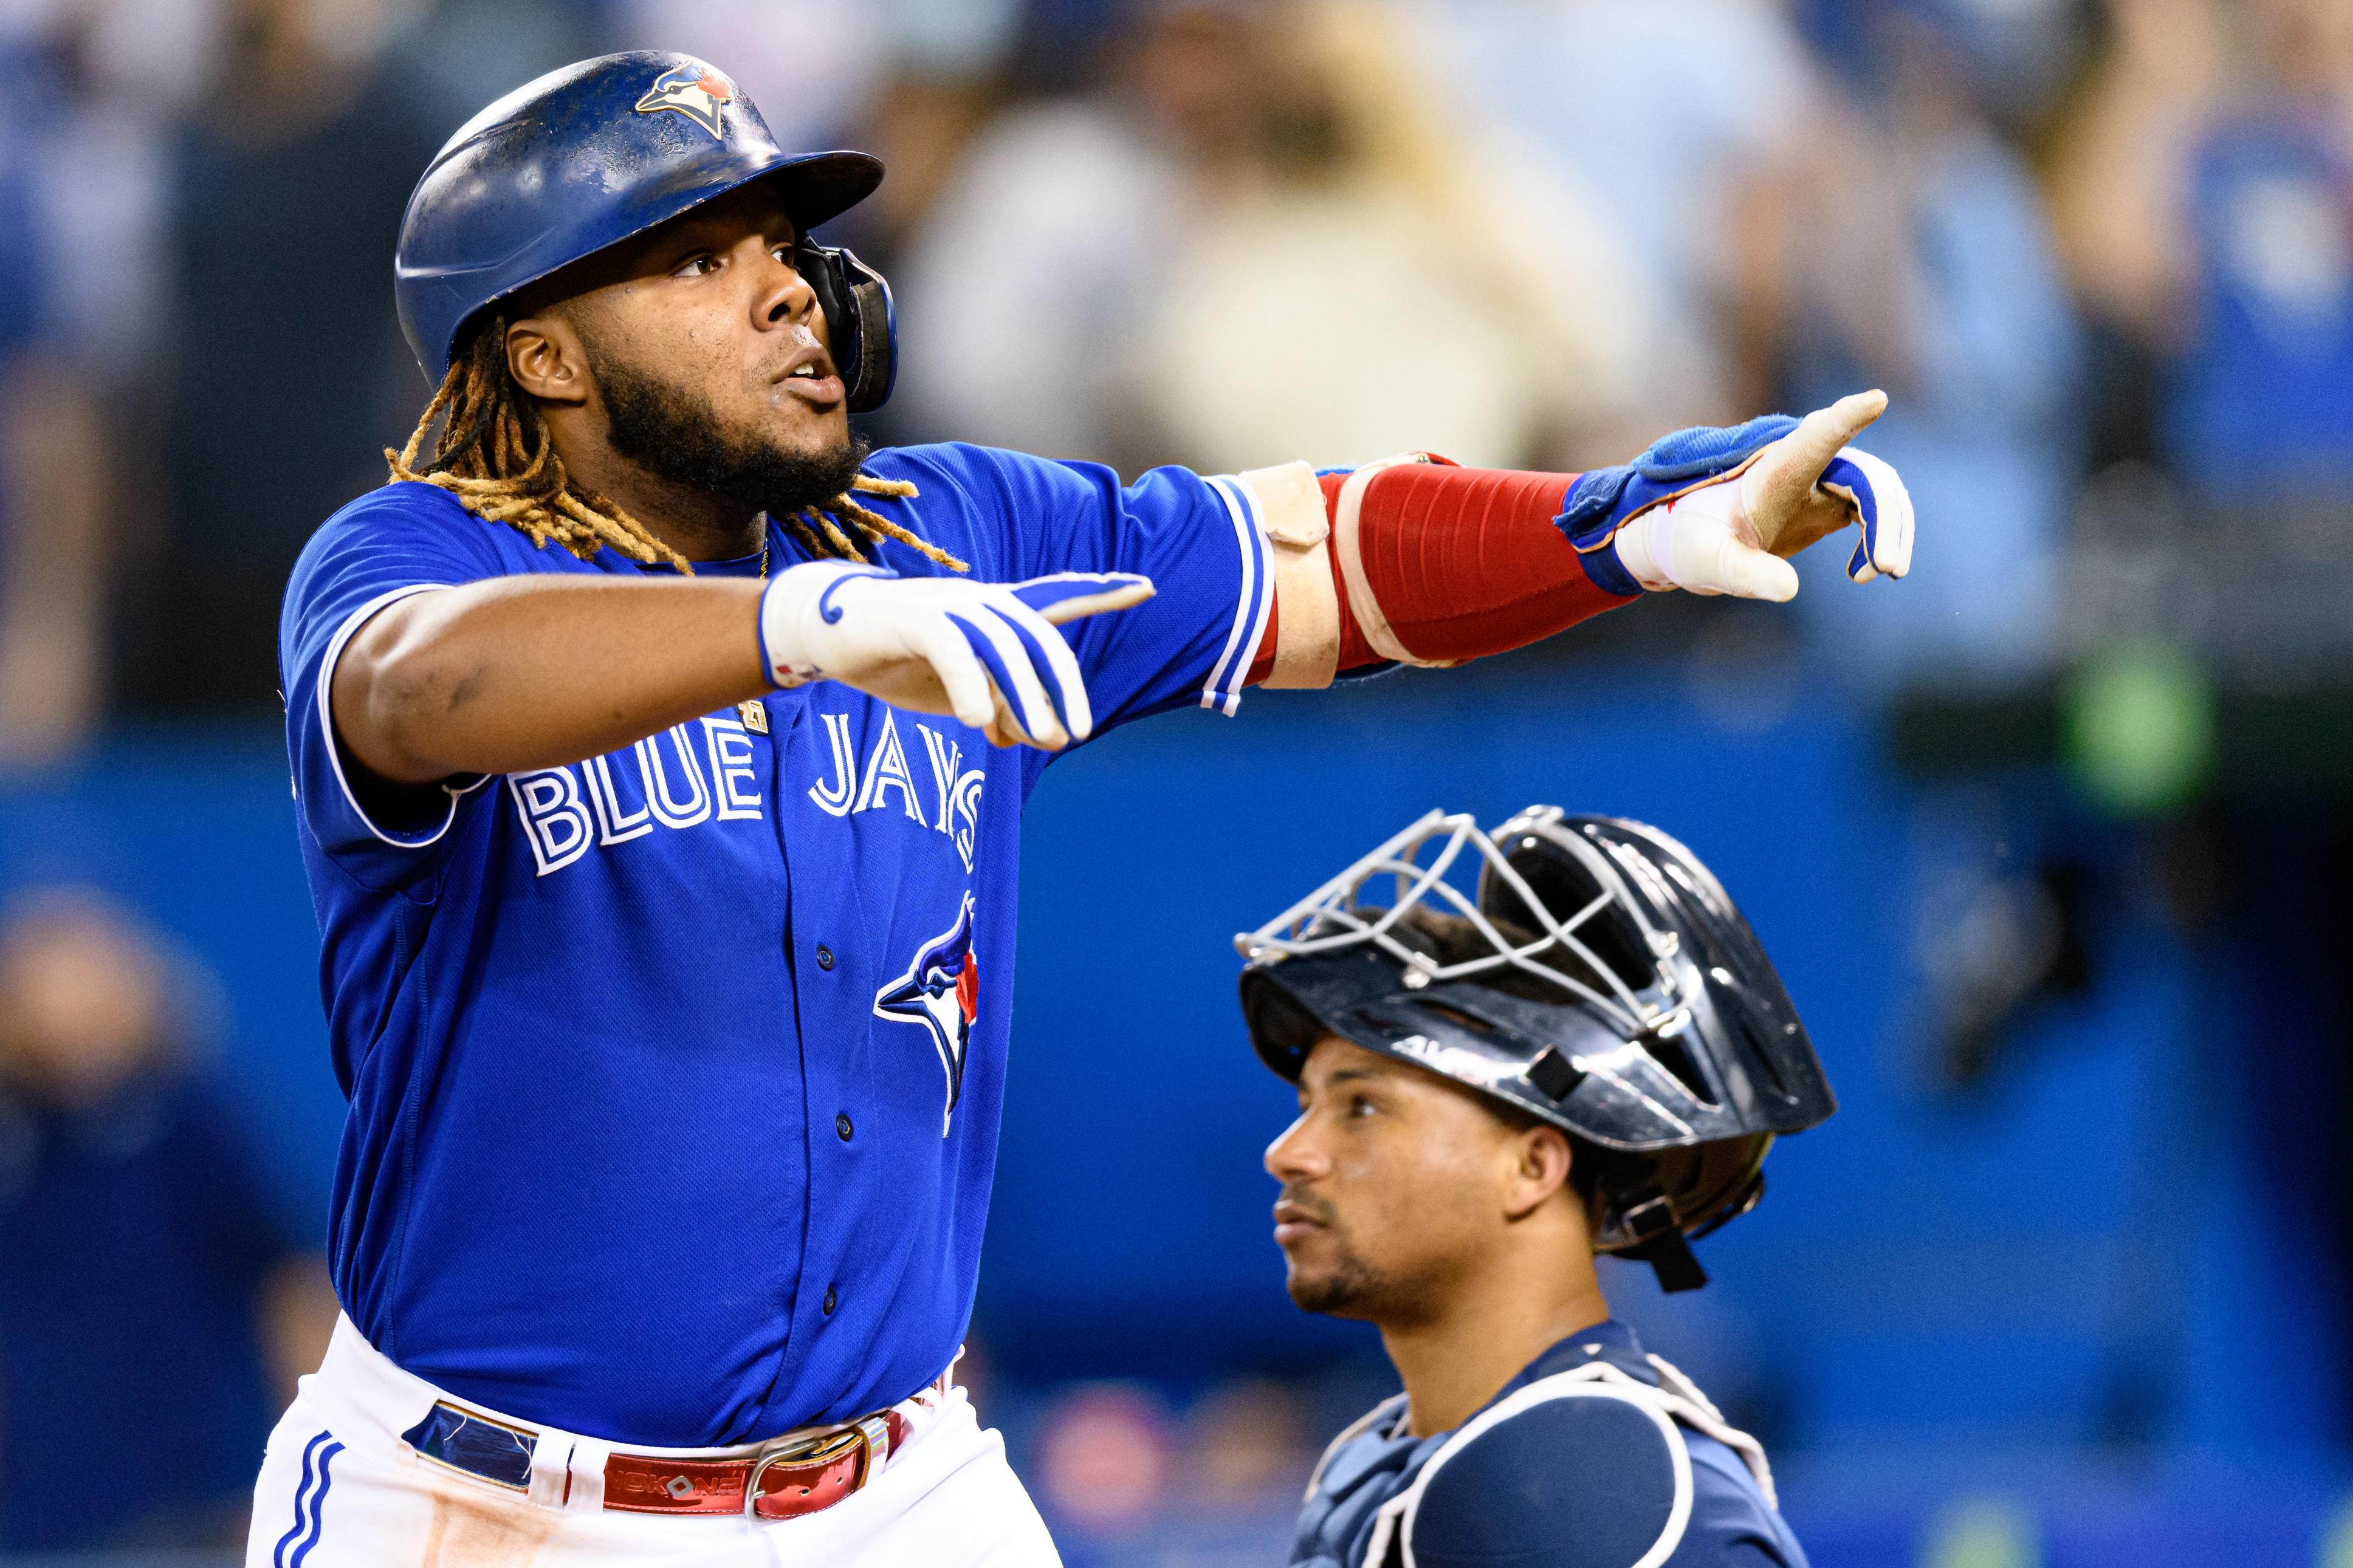 MLB: SEP 13 Rays at Blue Jays